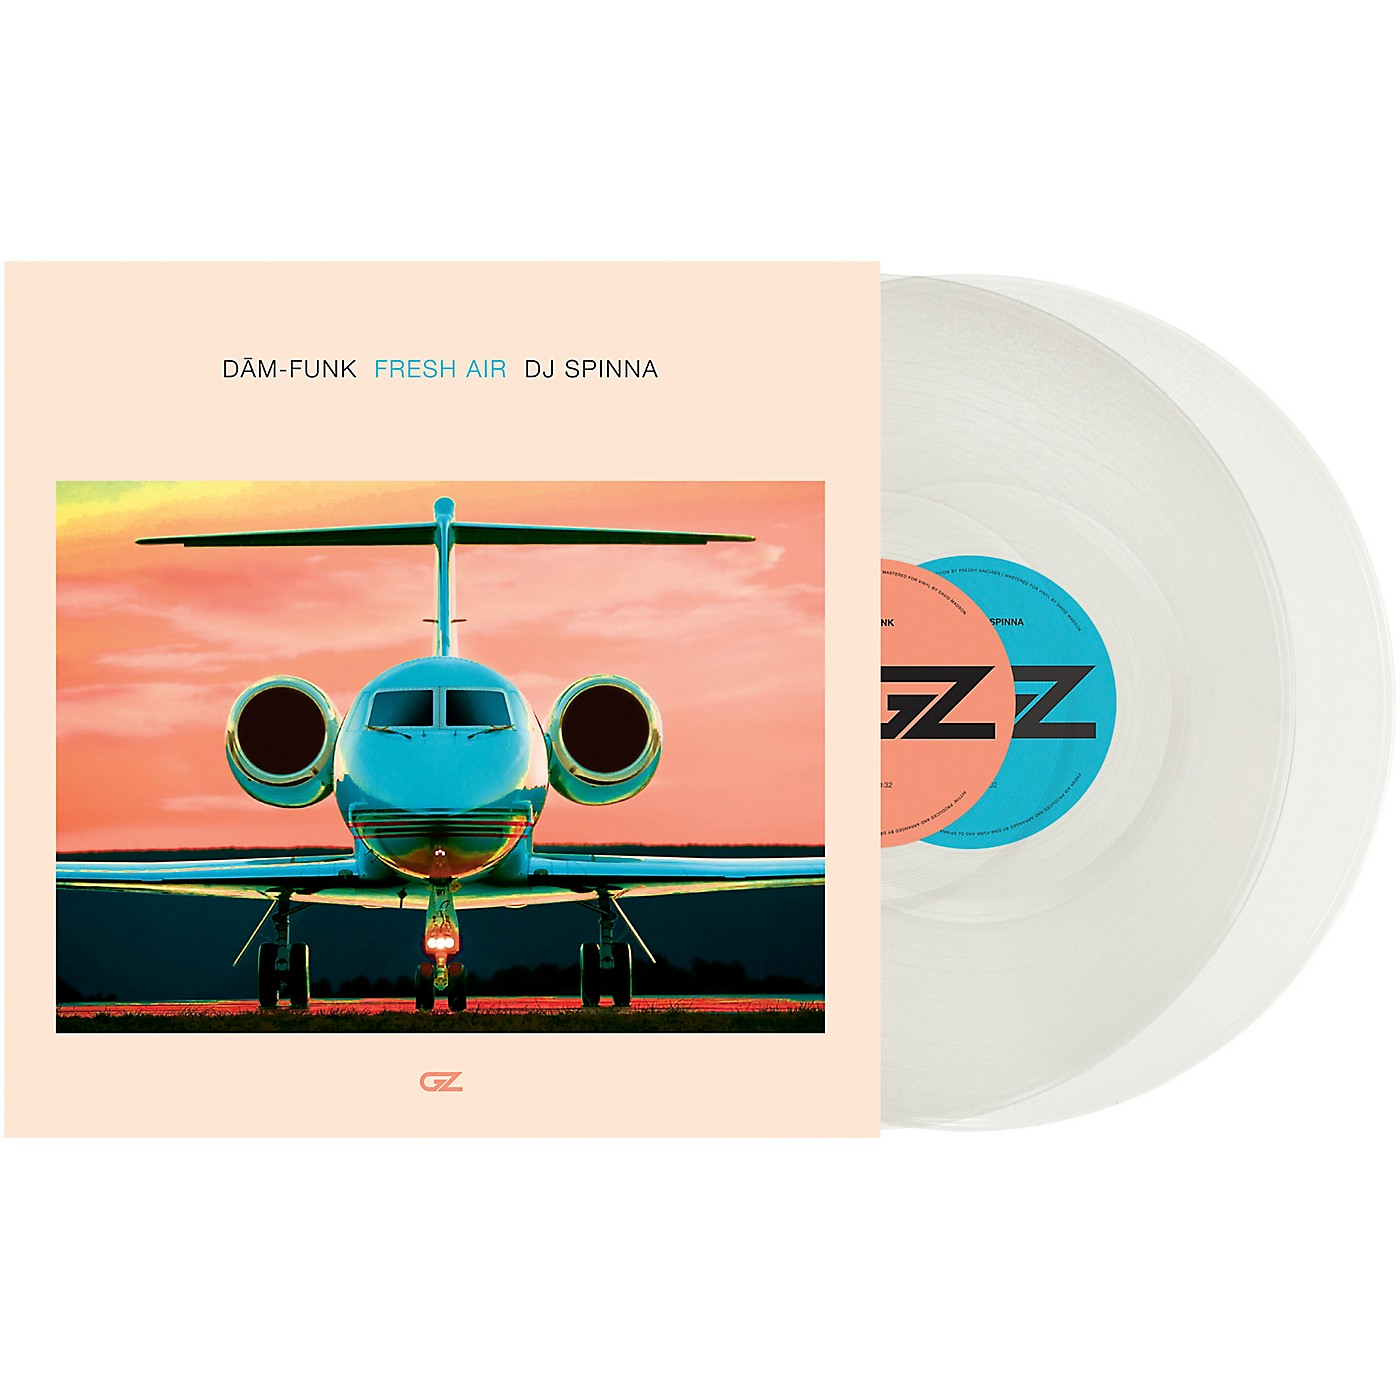 SERATO Dam-Funk NoiseMap Timecode Control Vinyl Pair thumbnail